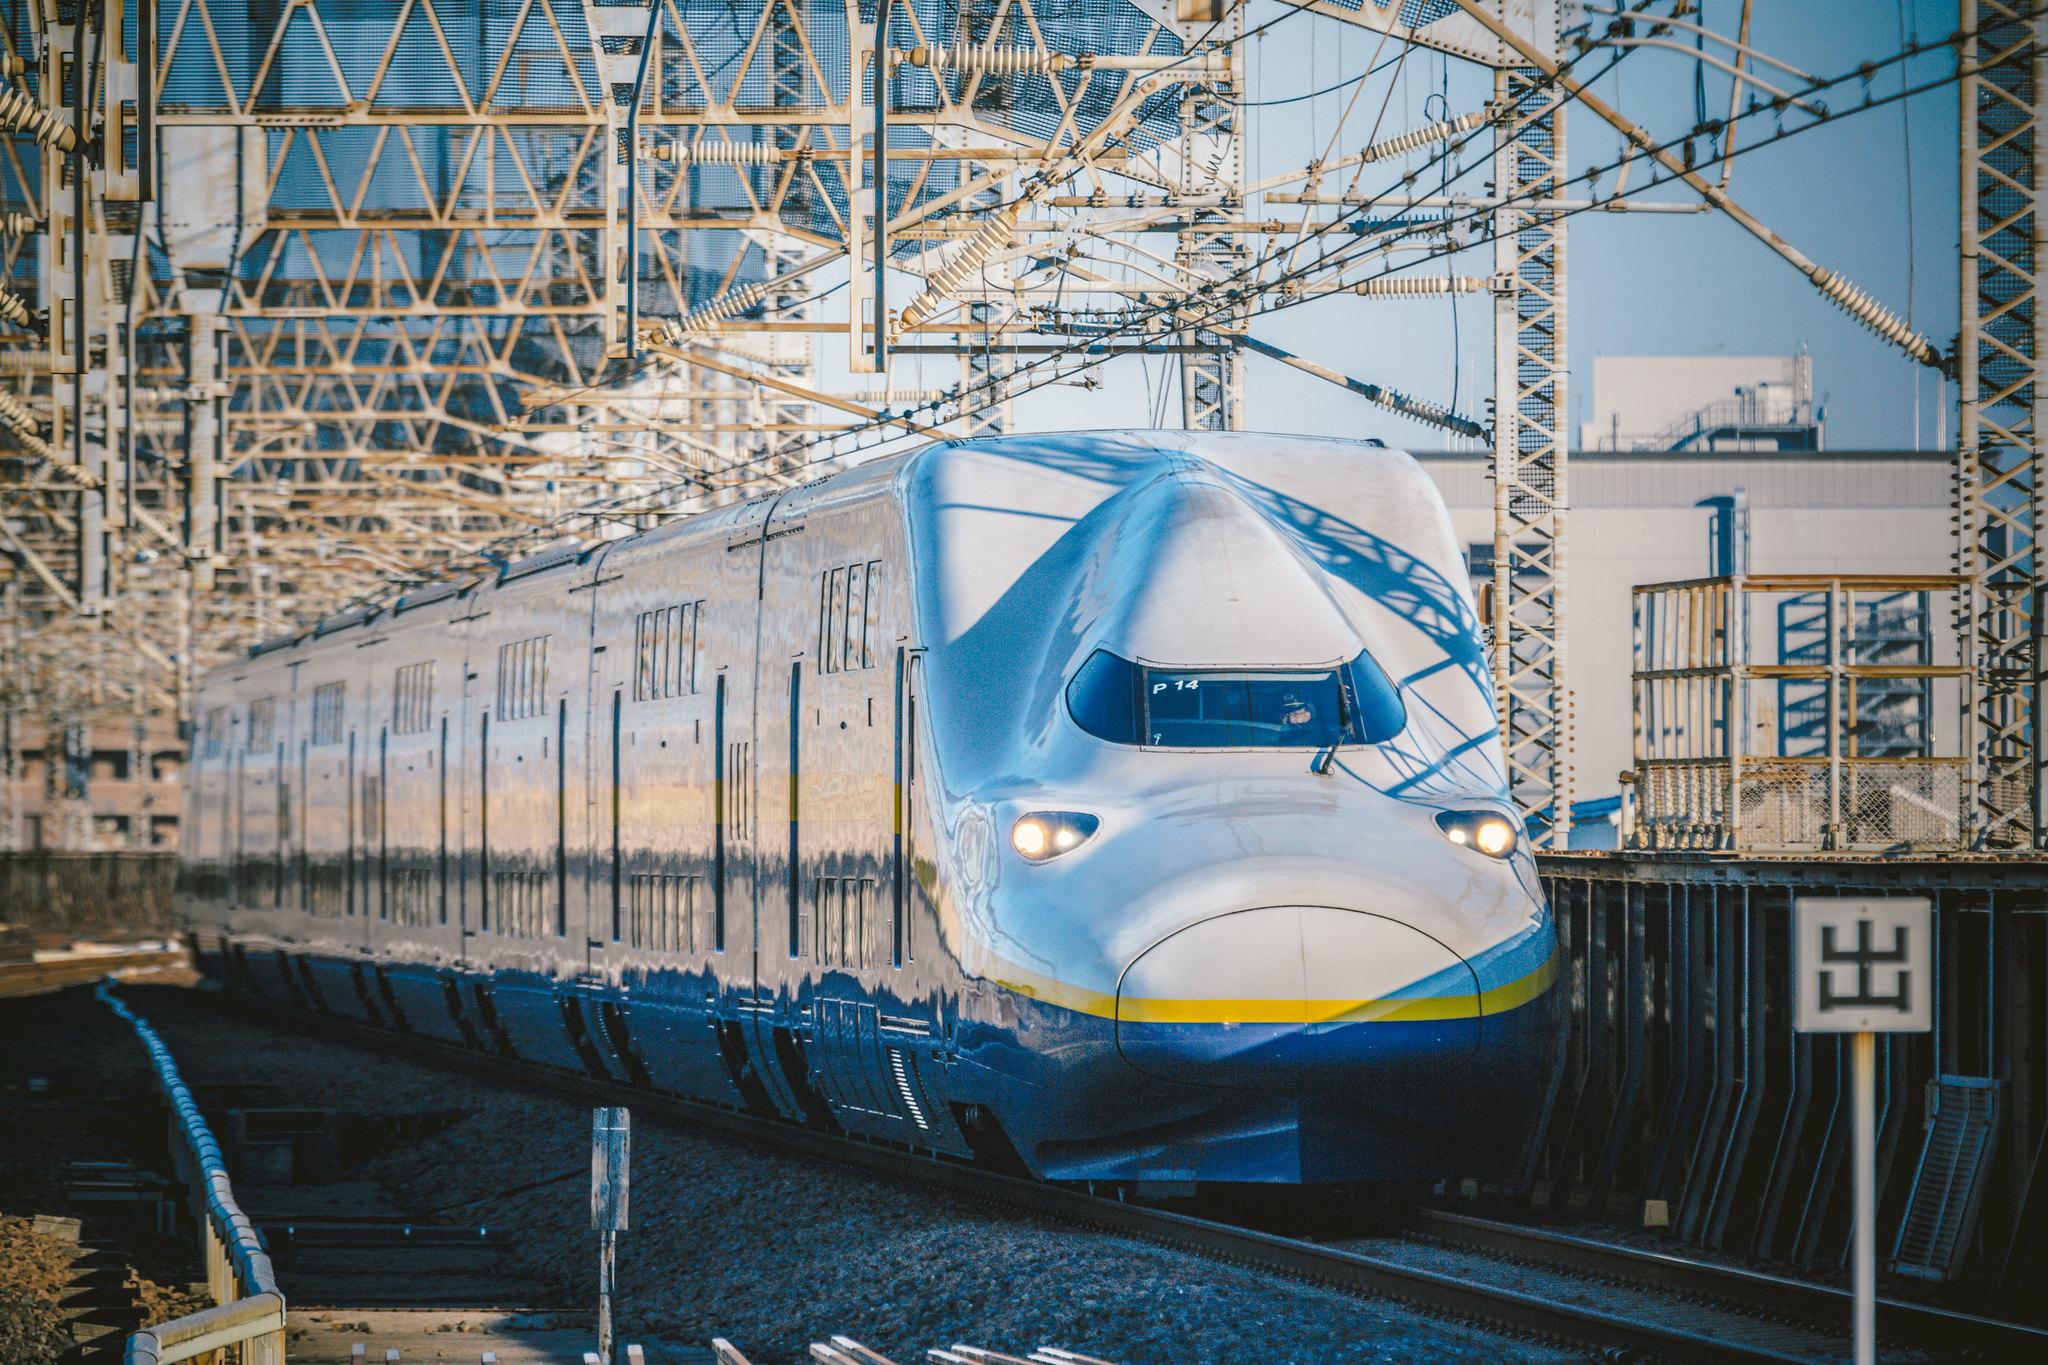 Shinkansen treinen, de hogesnelheidstreinen van Japan